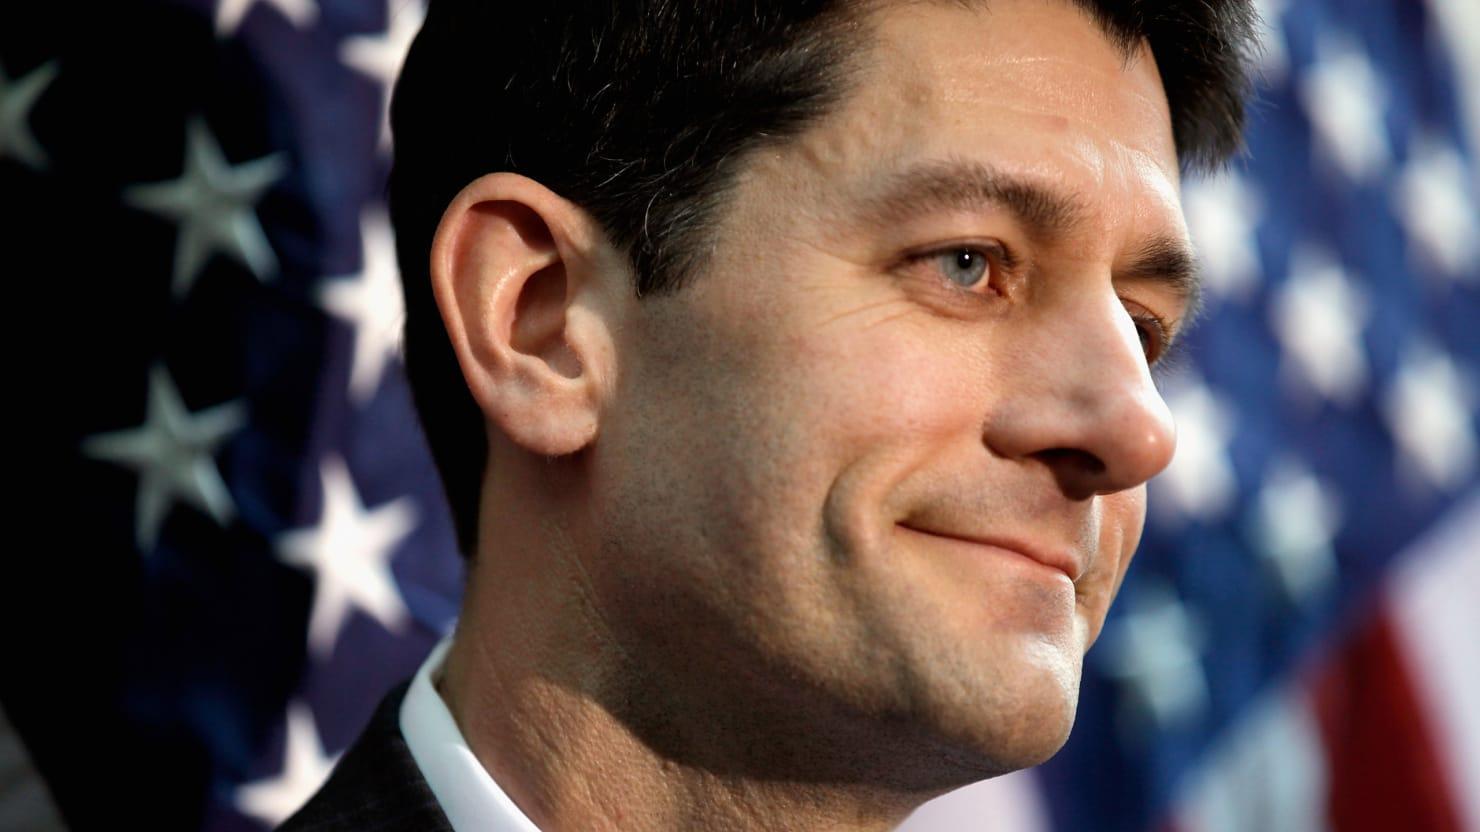 In Defense of Paul Ryan: He Isn't Racist, He's Right